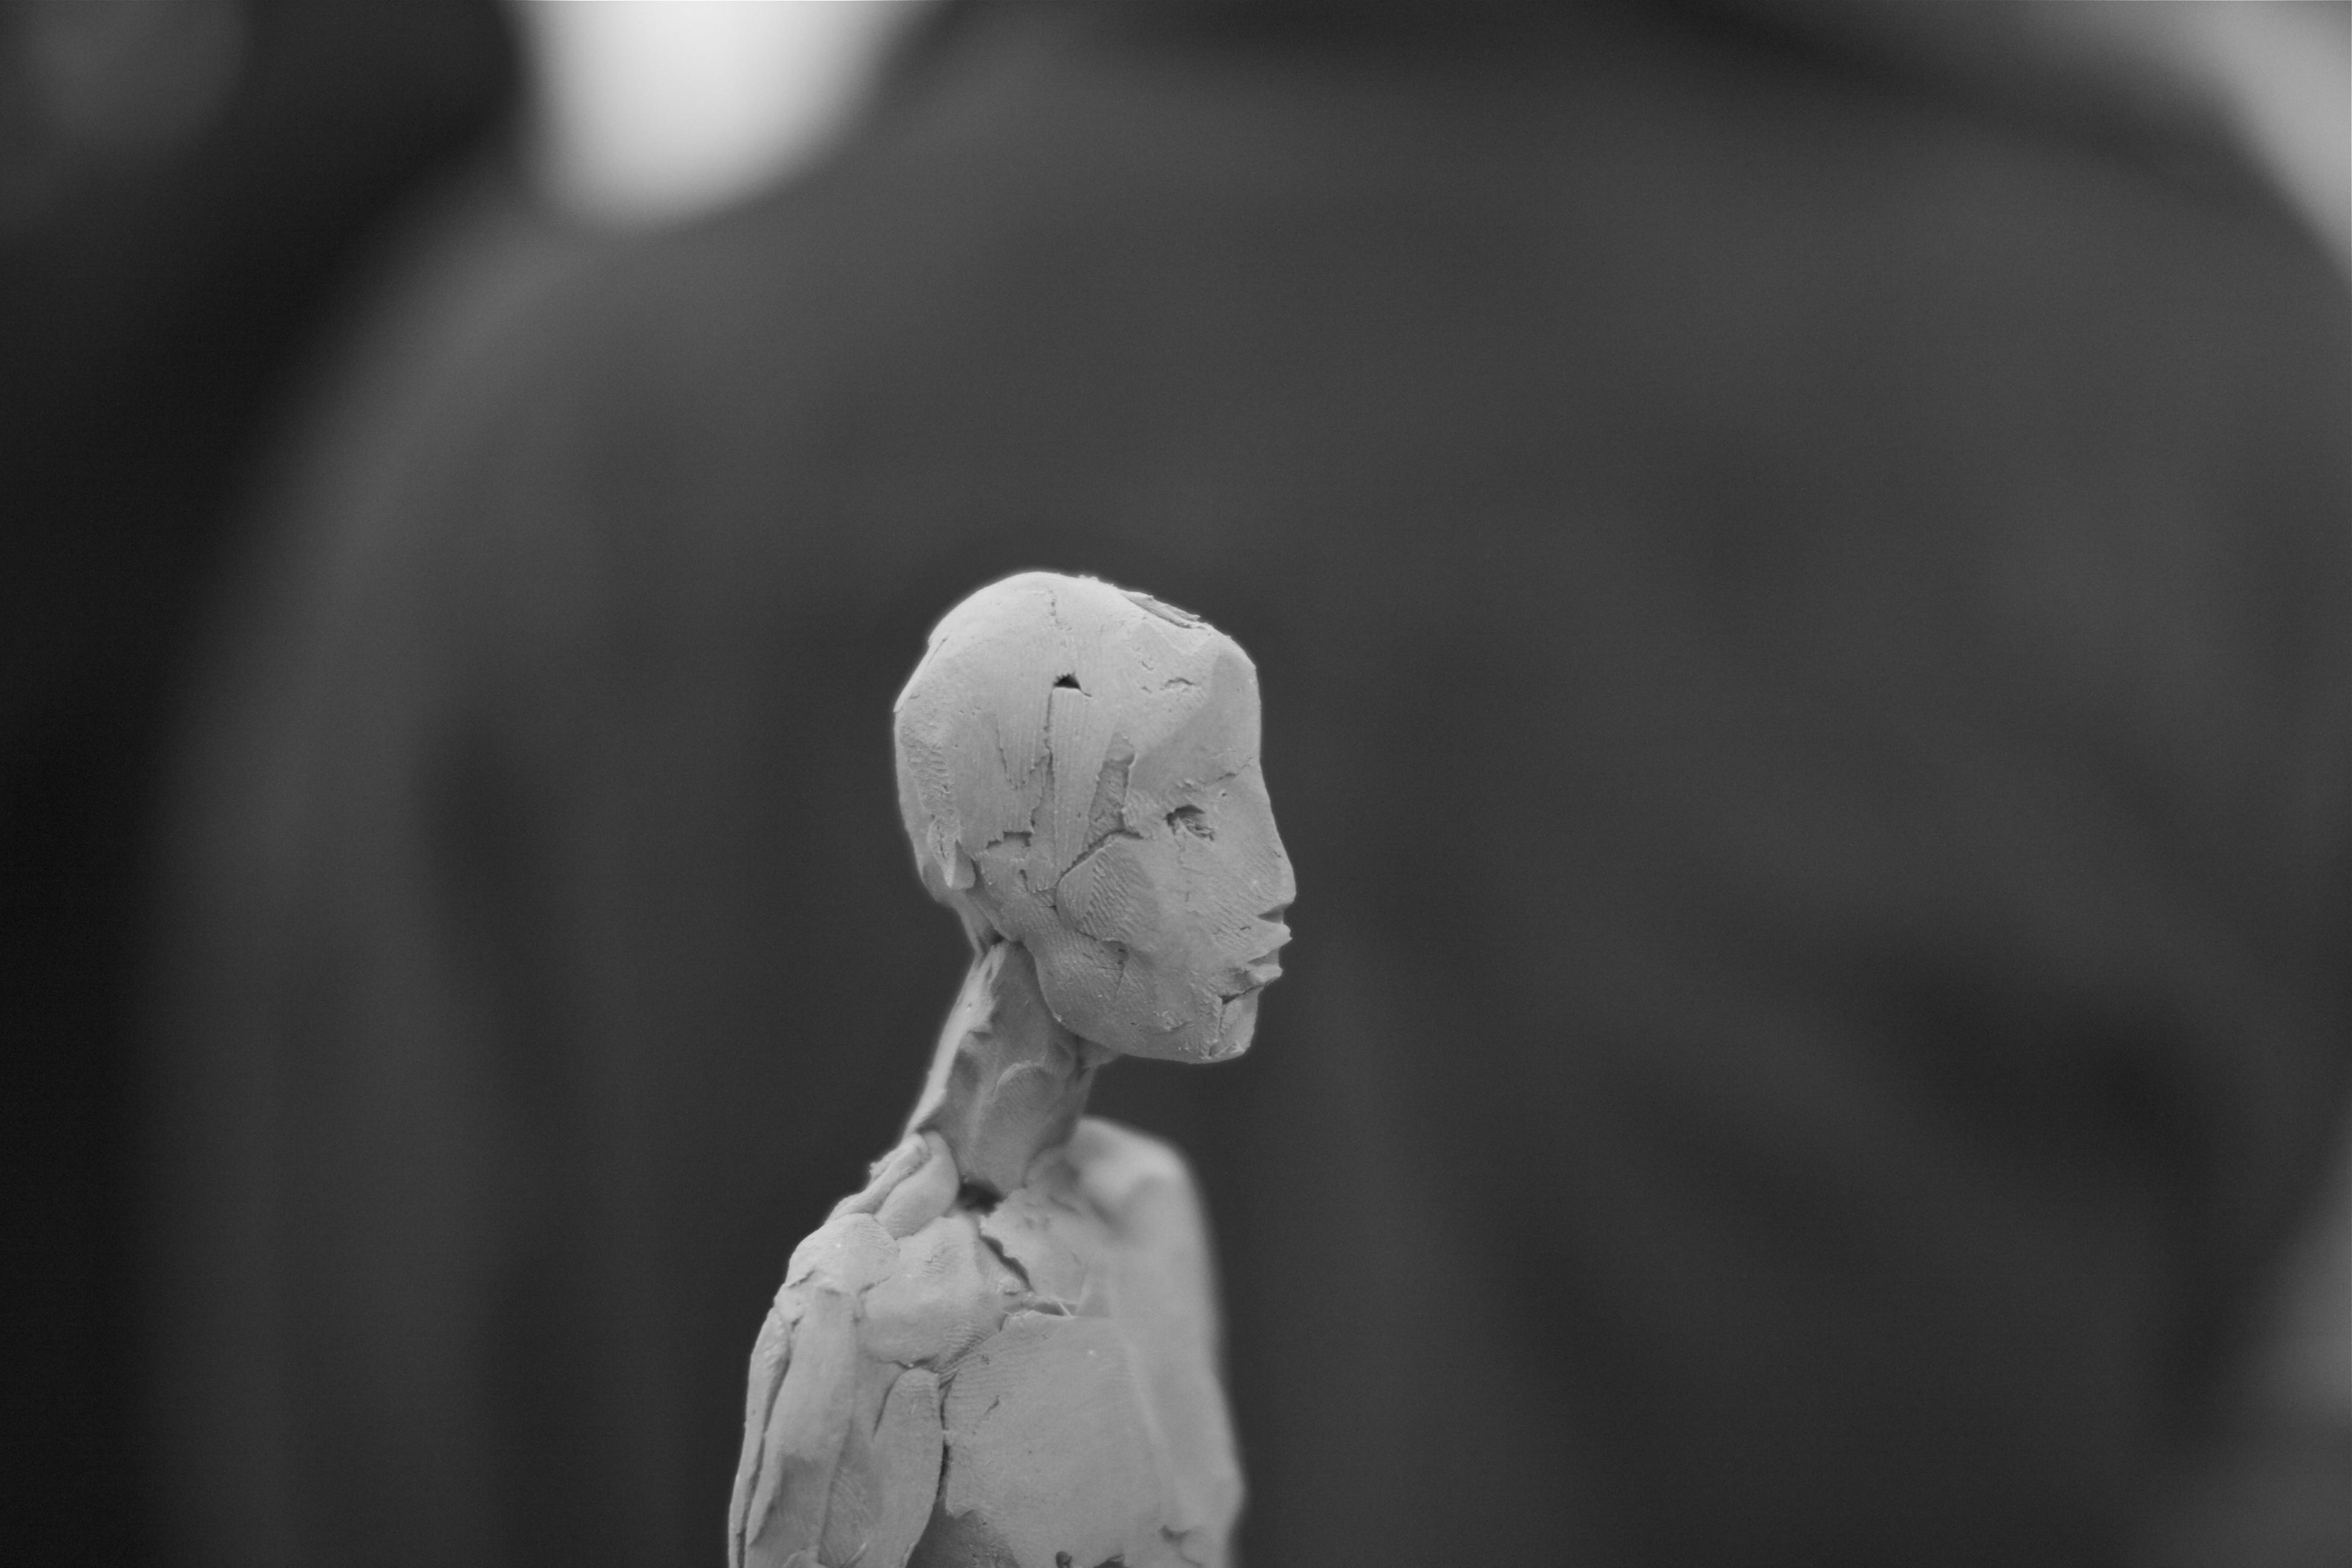 Flickr - Aron Demetz - Dialoghi e materia - Workshop a cura di Franco Reina88